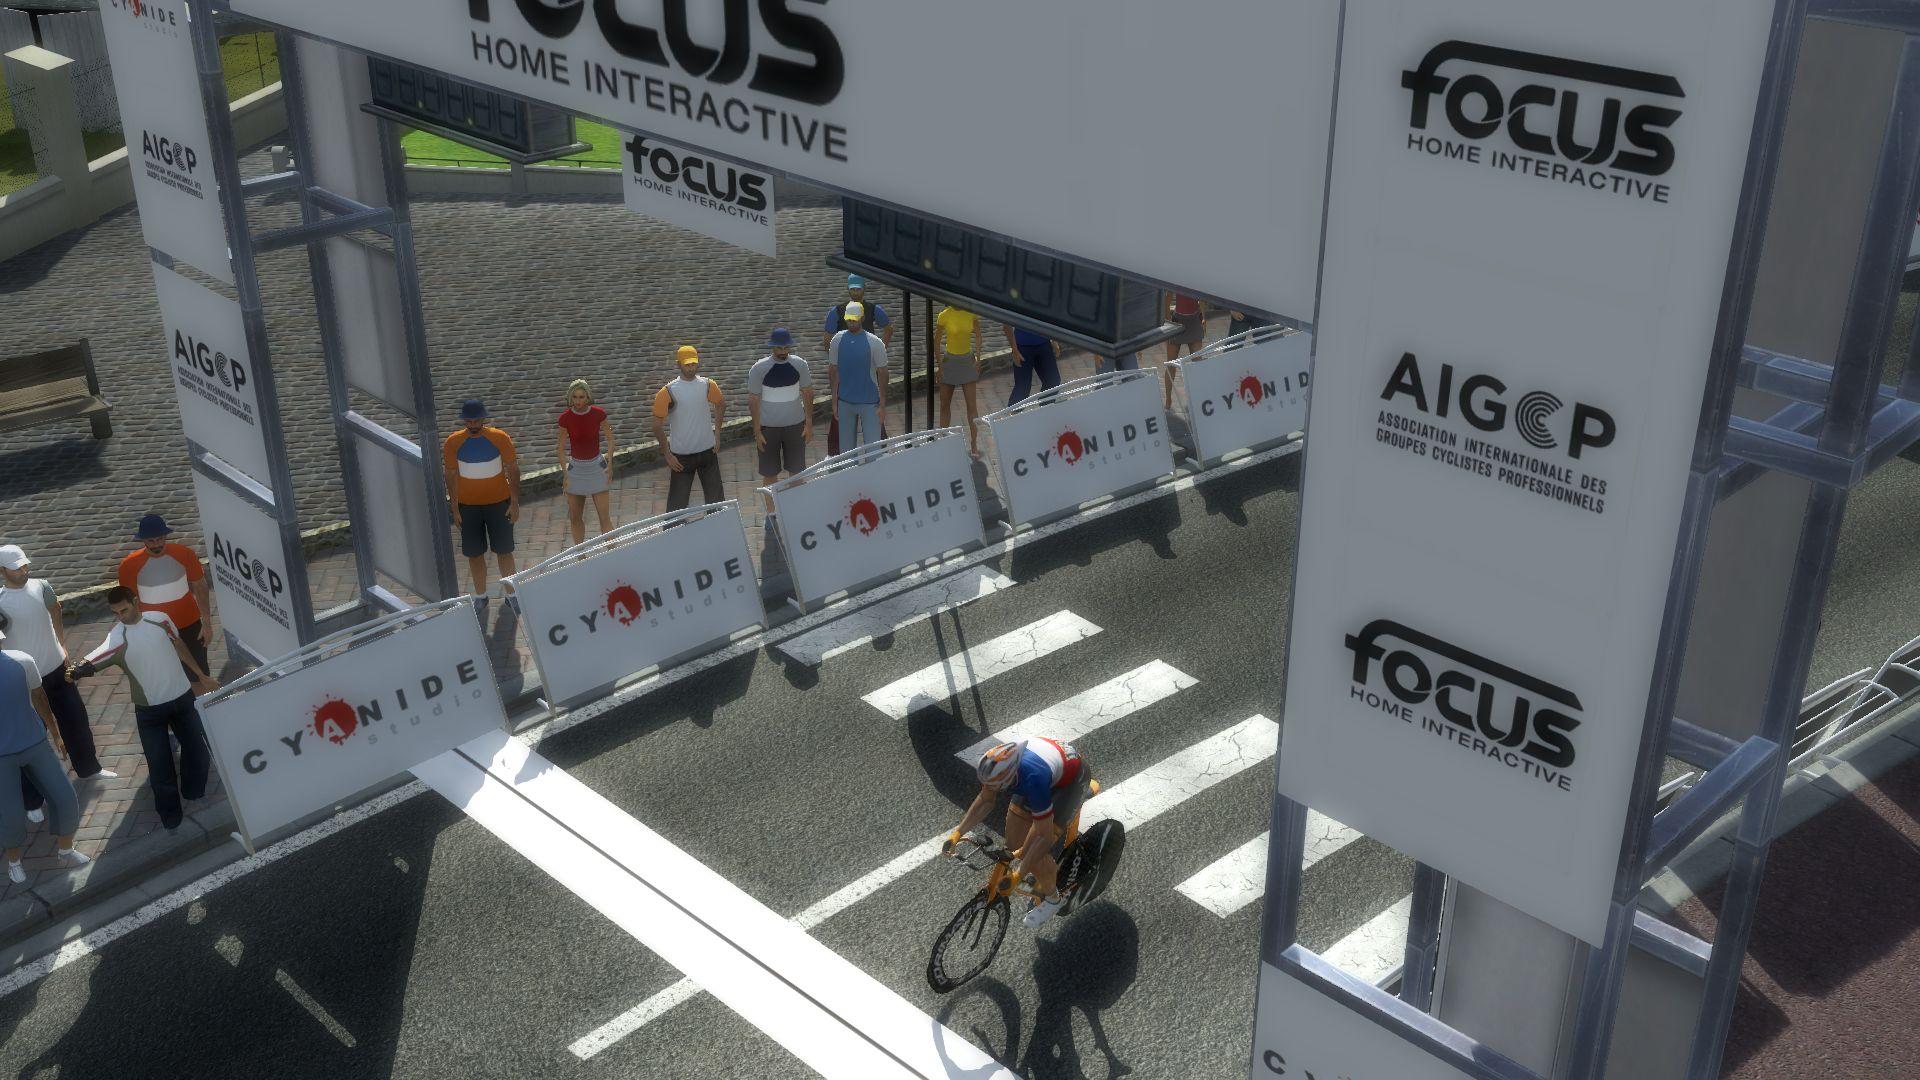 pcmdaily.com/images/mg/2019/Races/C1/Bayern/S4/mg19_bay_s04_05.jpg